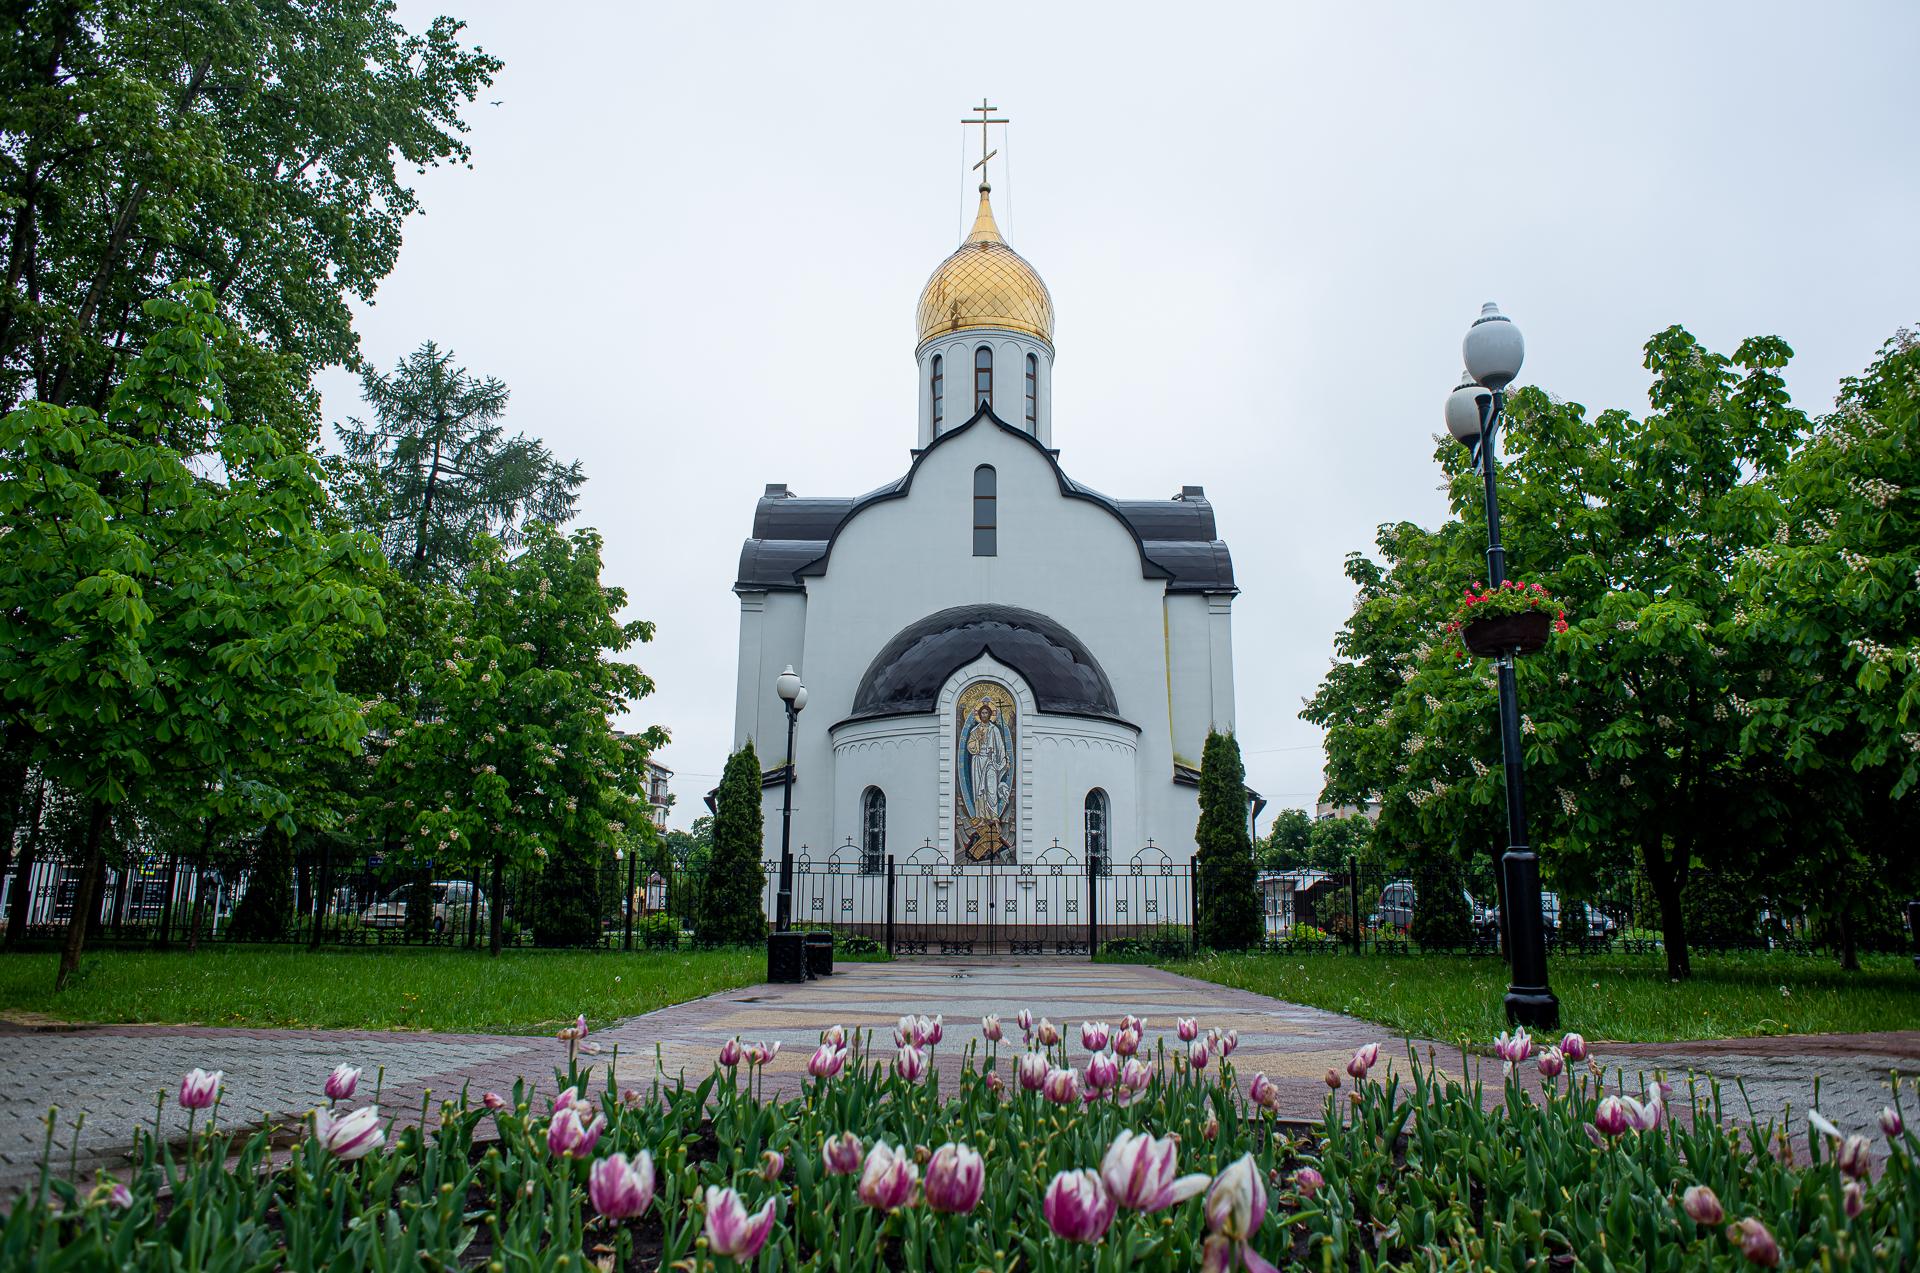 Балашиха, Храм Святого Благоверного Князя Александра Невского